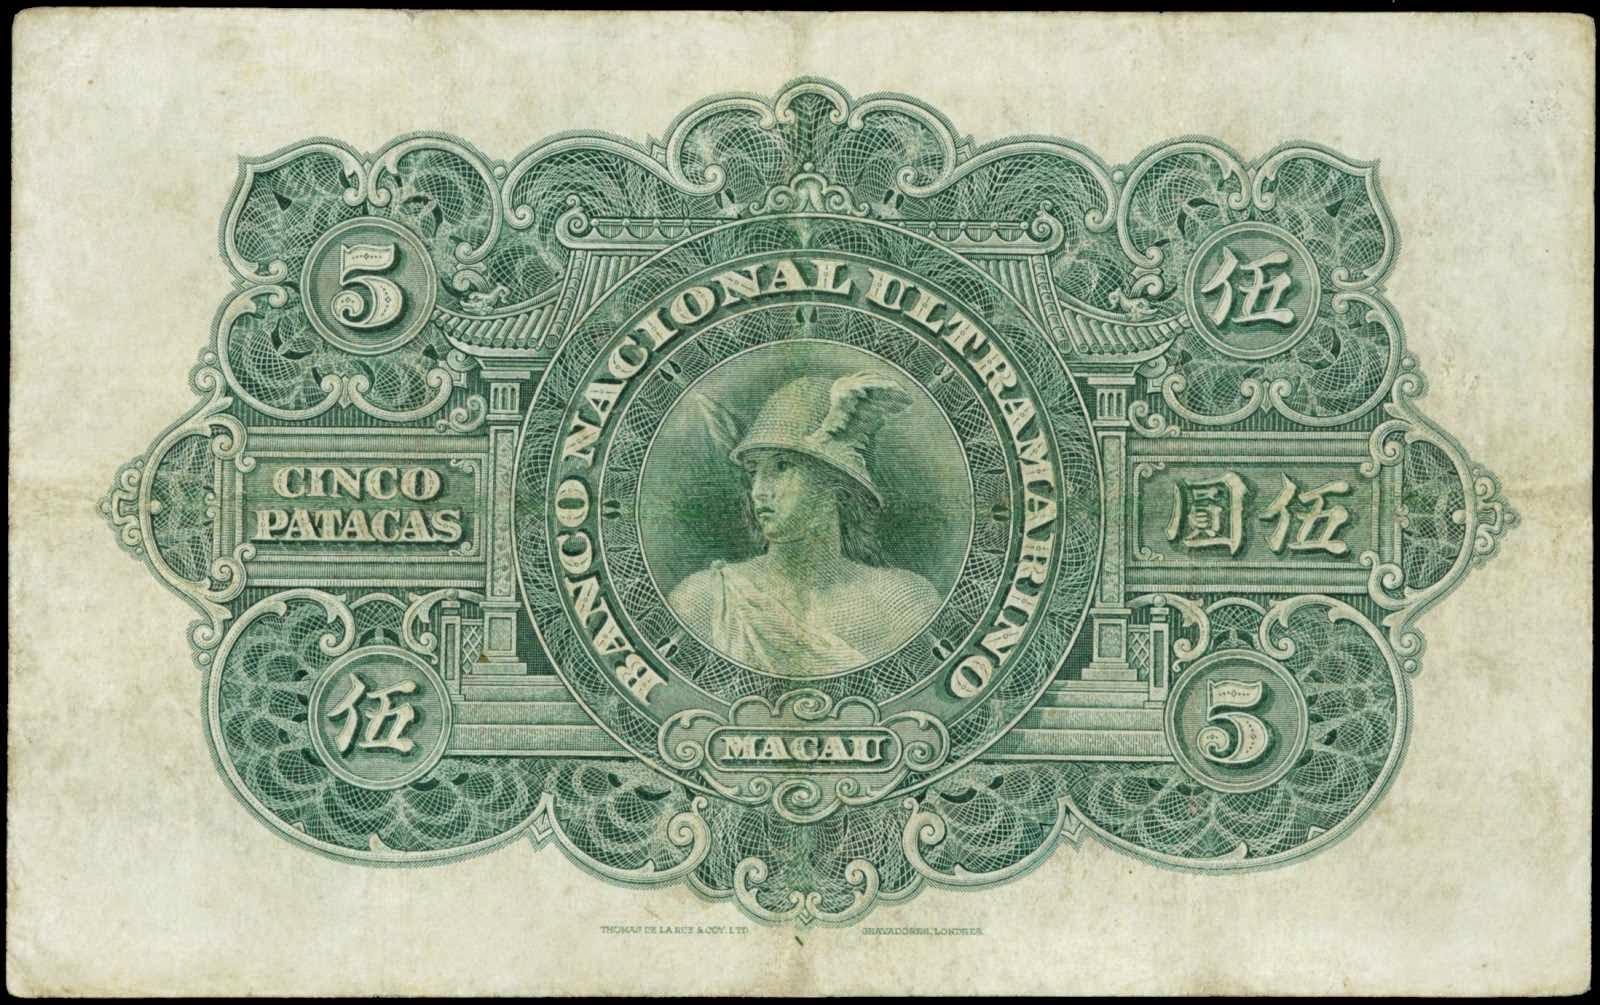 Macao Paper Money 5 Patacas 1924 Banco Nacional Ultramarino